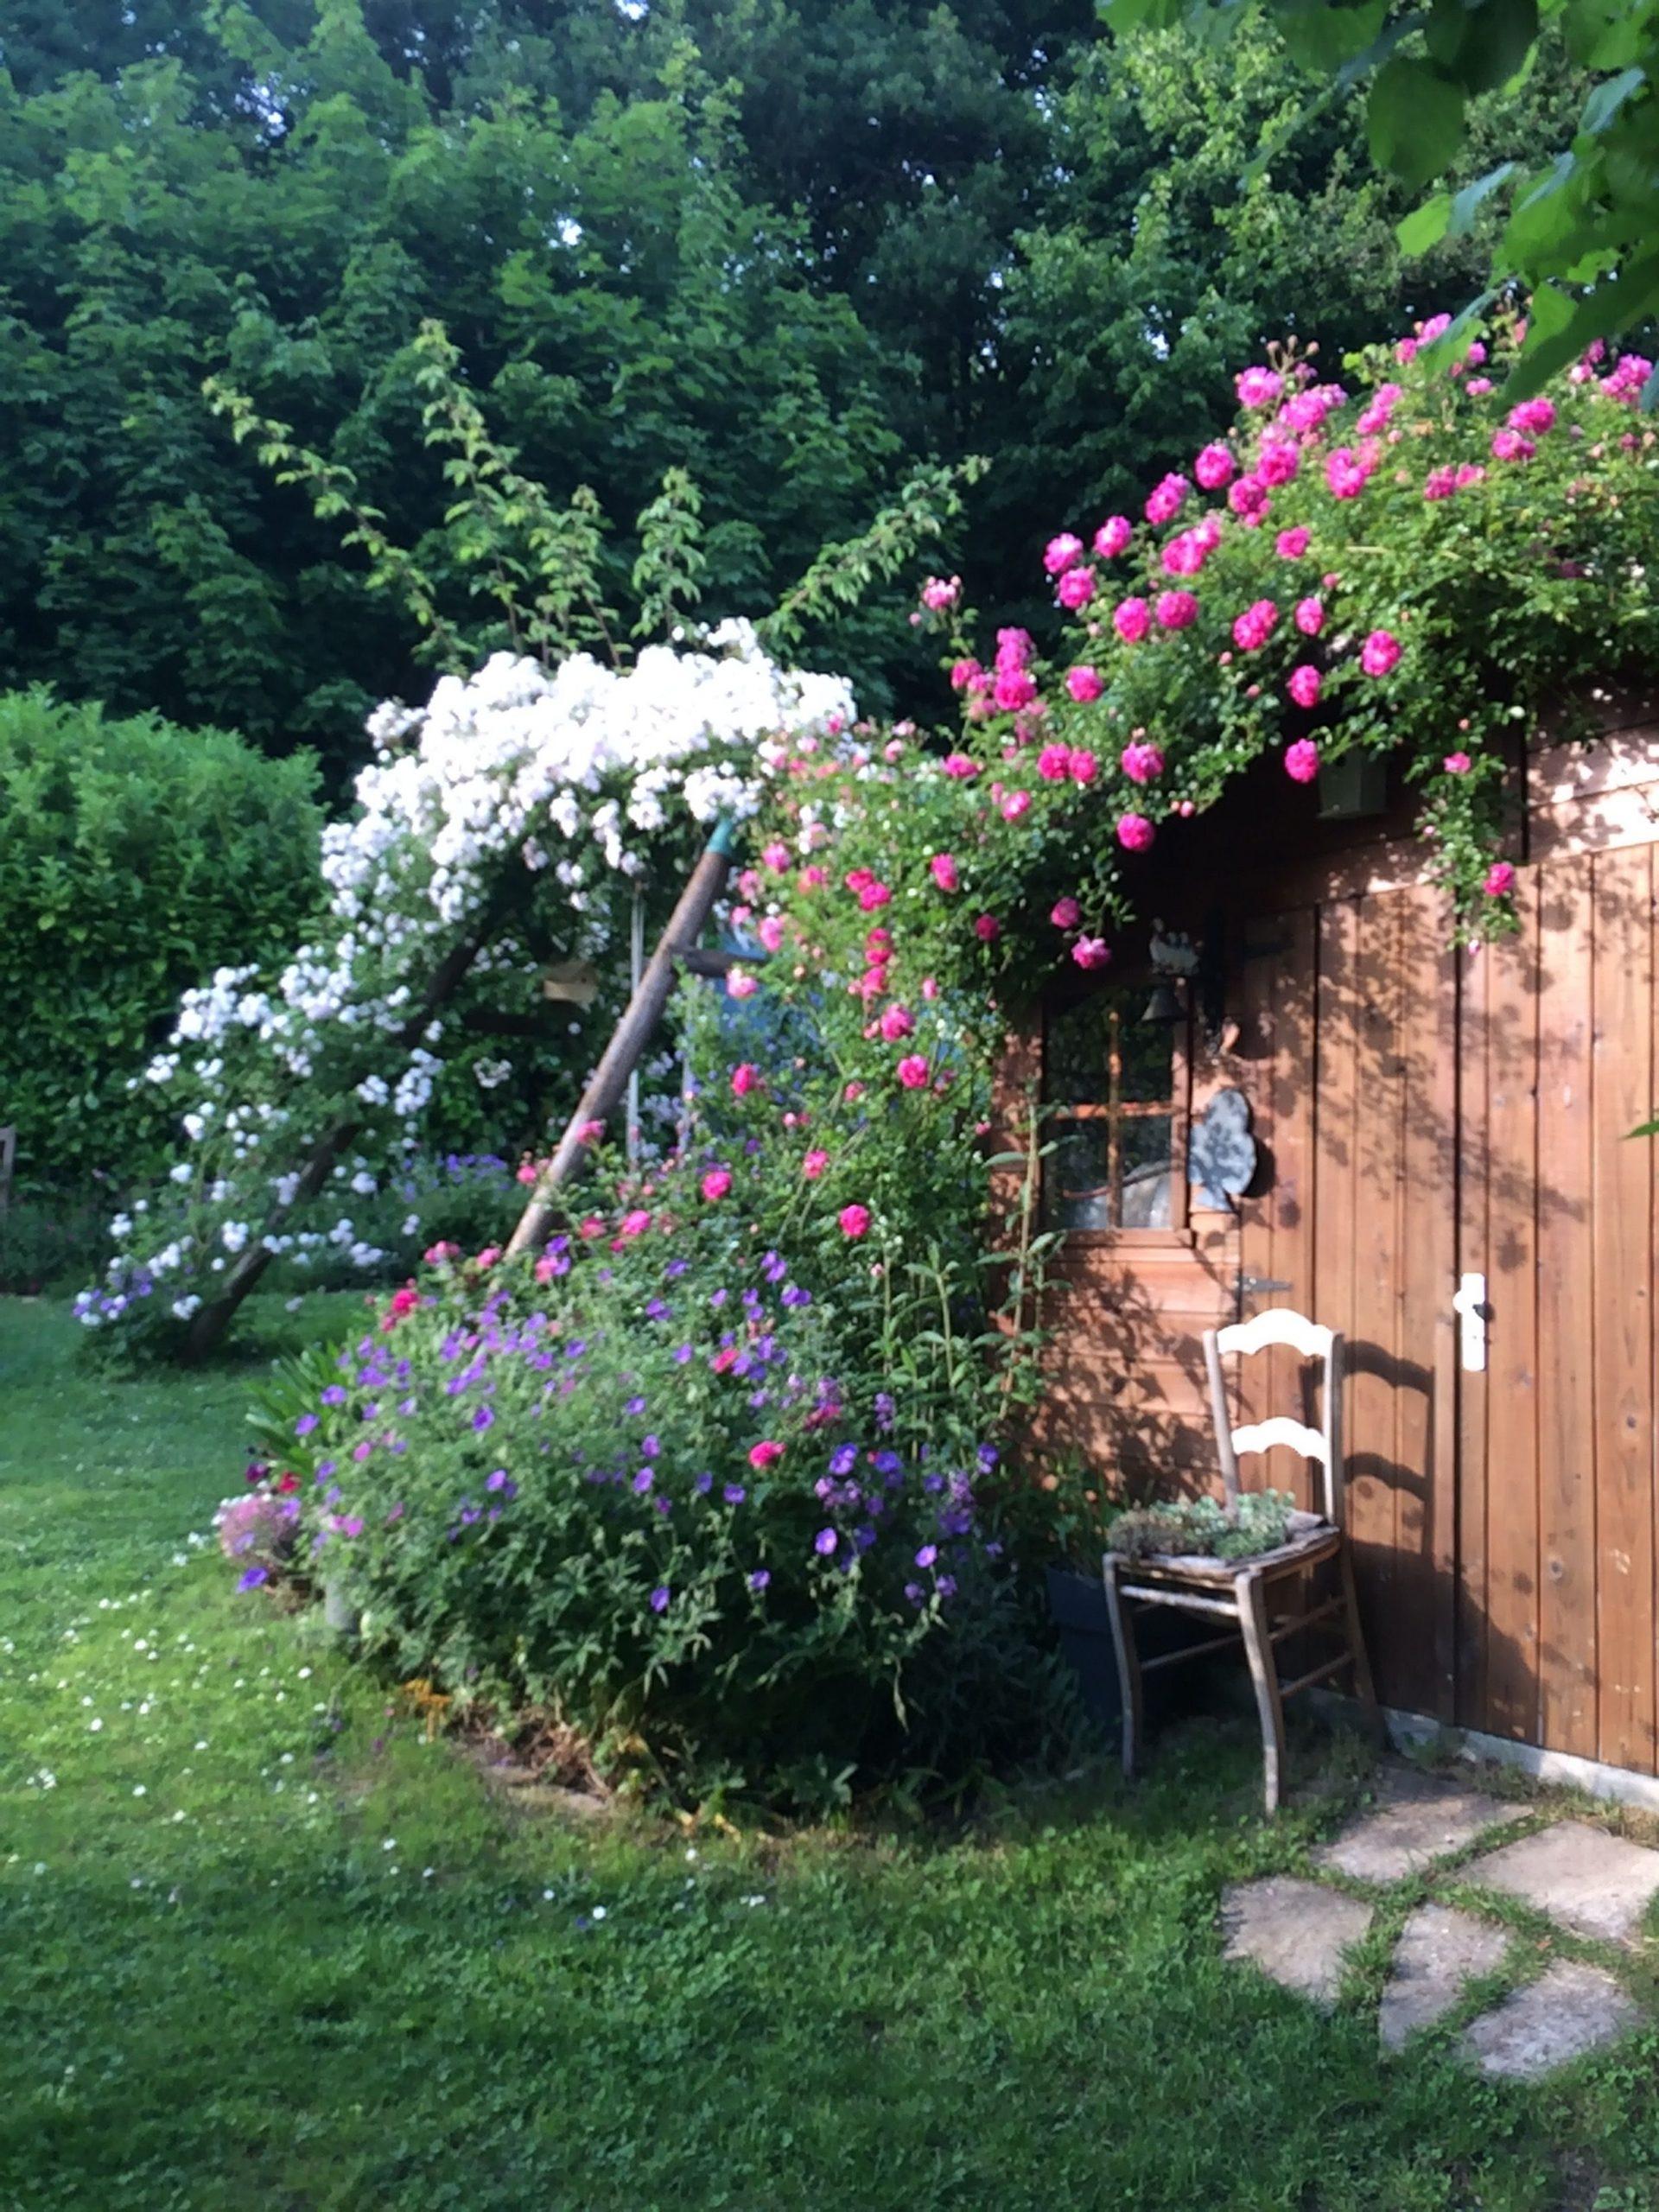 Jardin Le Petit Grillon   Jardins Et Grillon dedans Asperseur Jardin